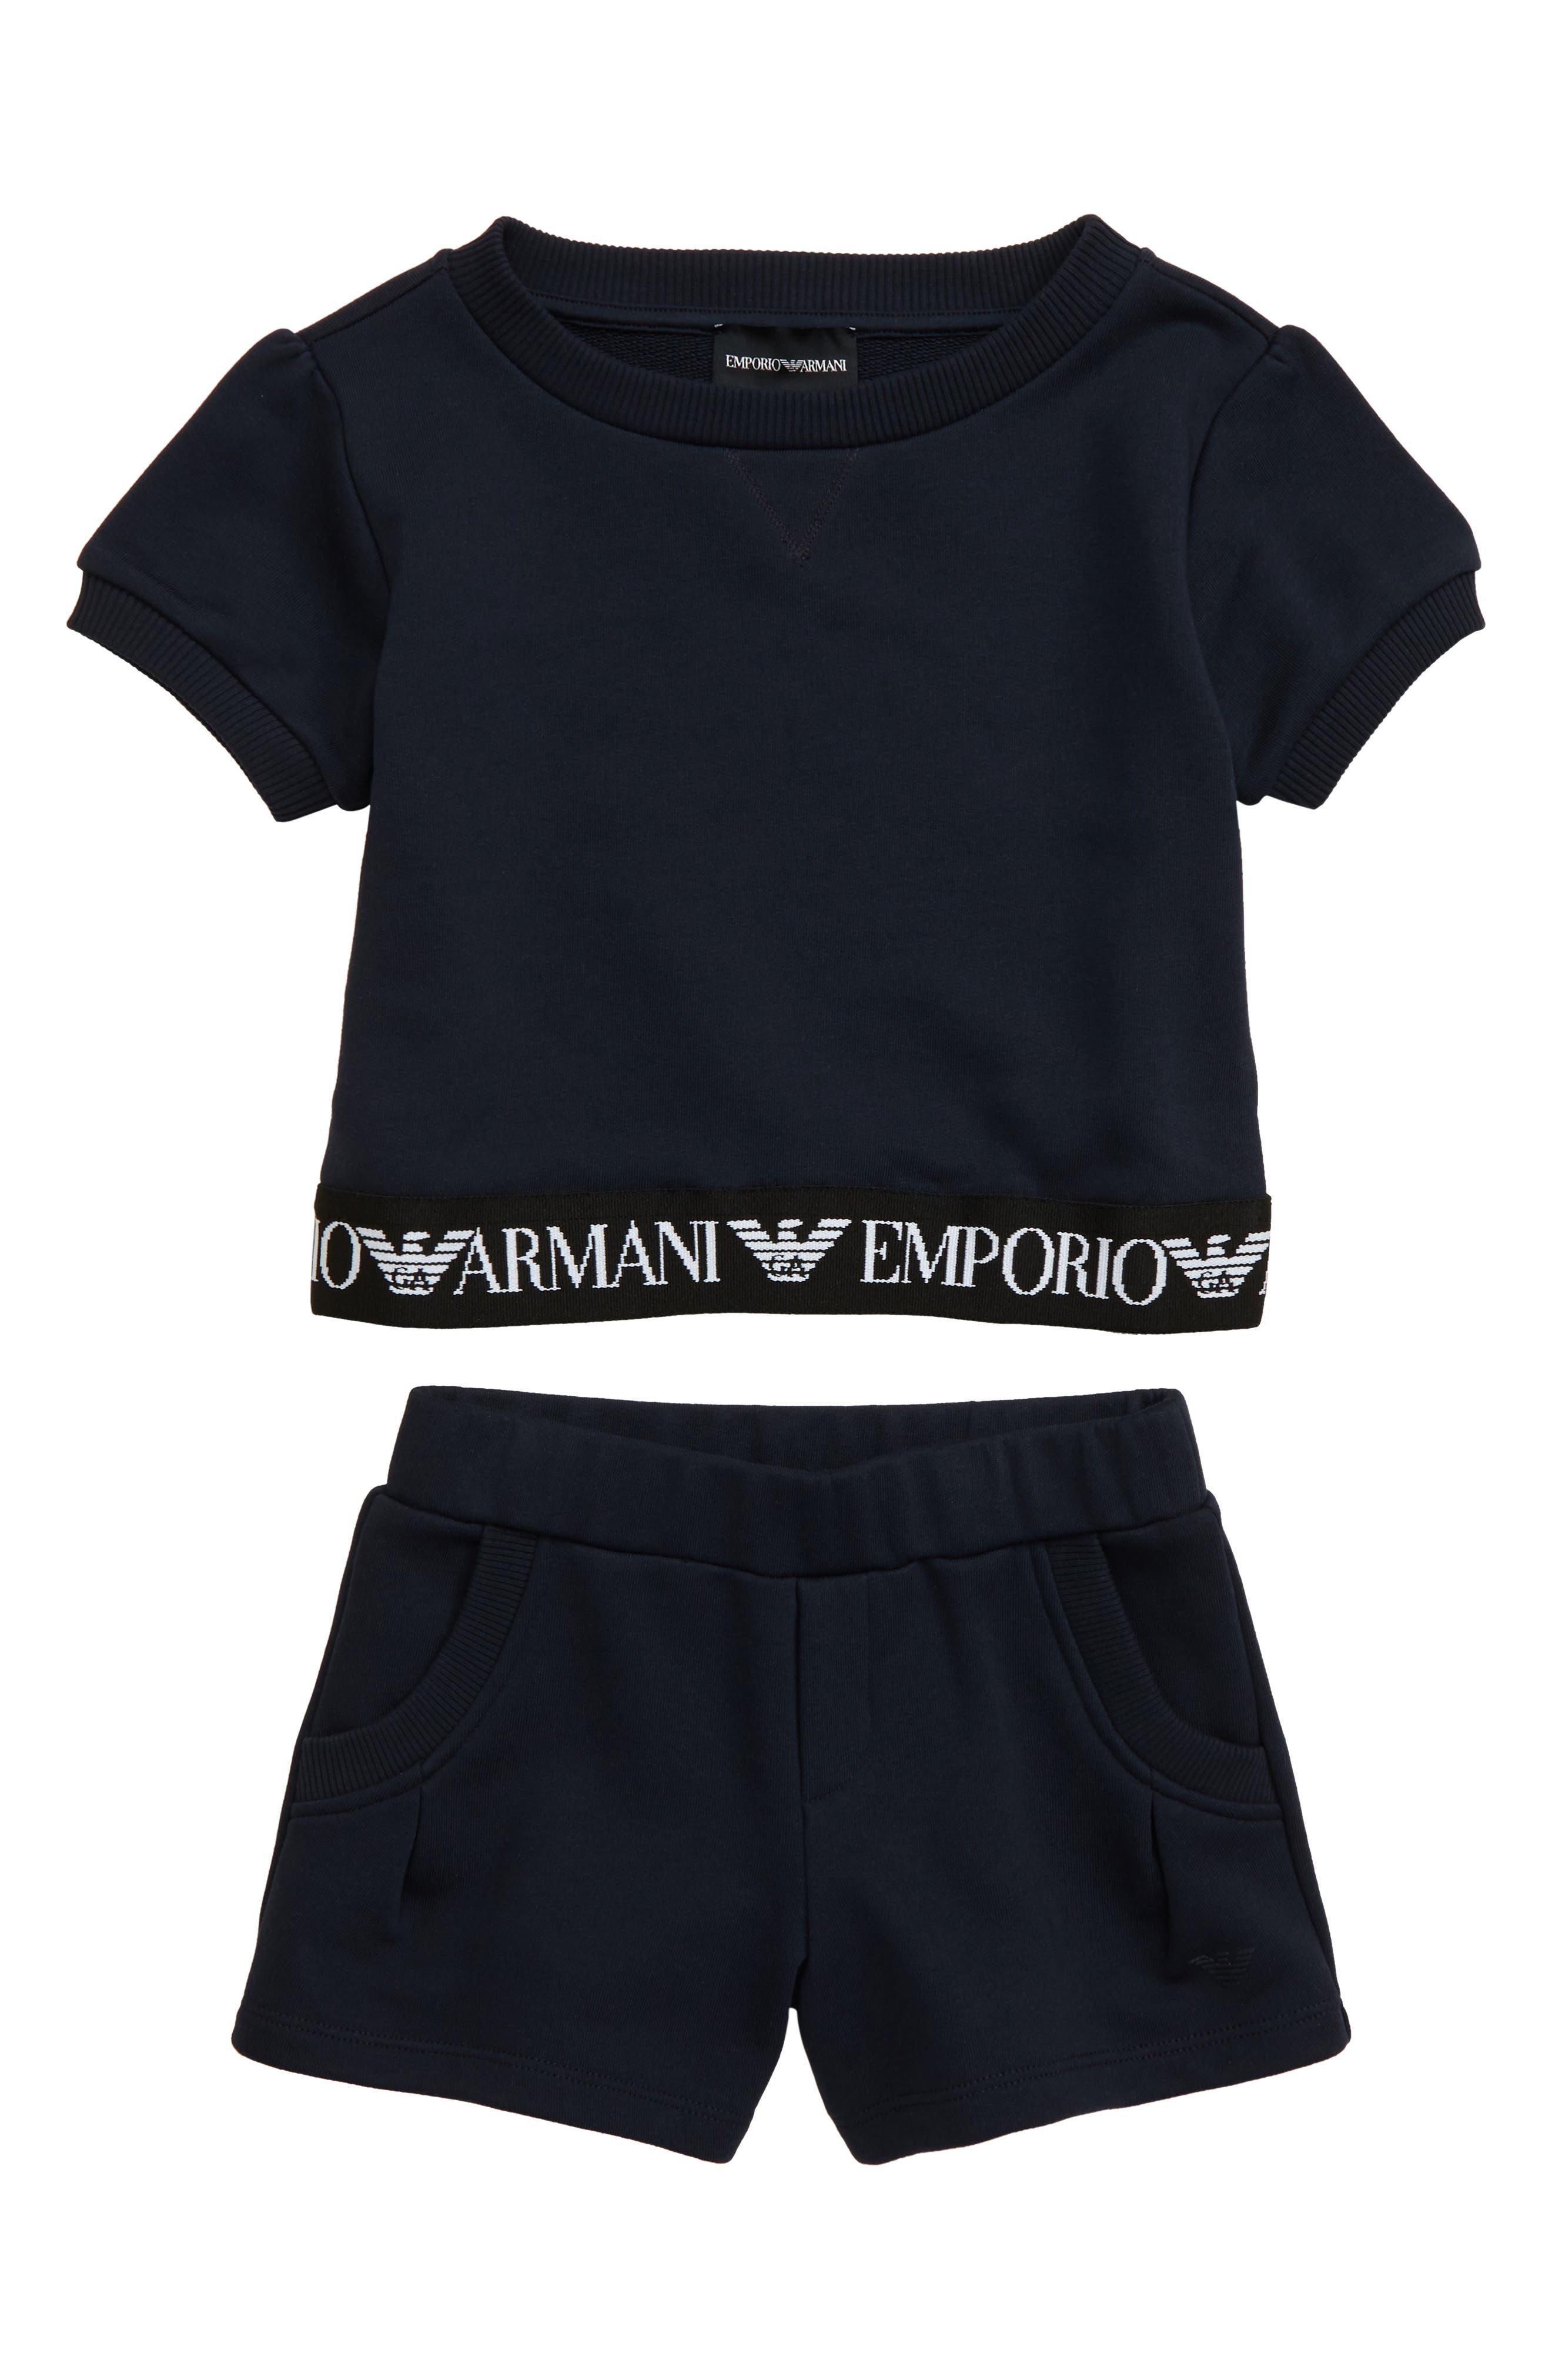 Girls Armani Junior Logo Short Sleeve Sweatshirt  Shorts Set